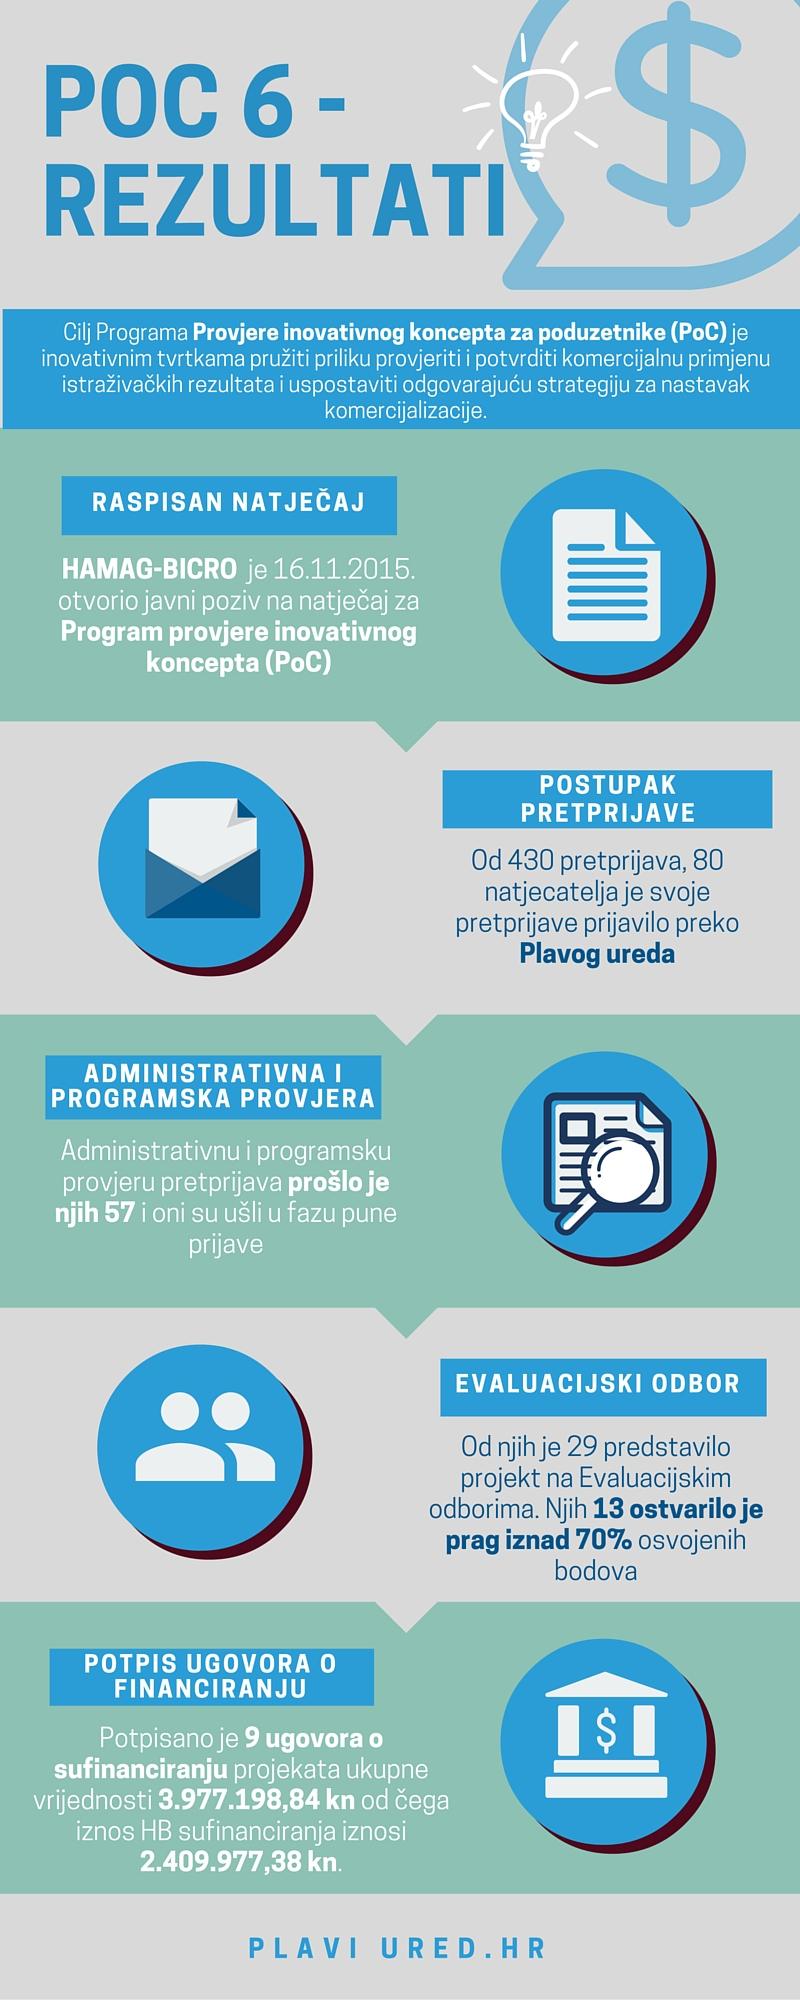 PoC 6 - rezultati infografika